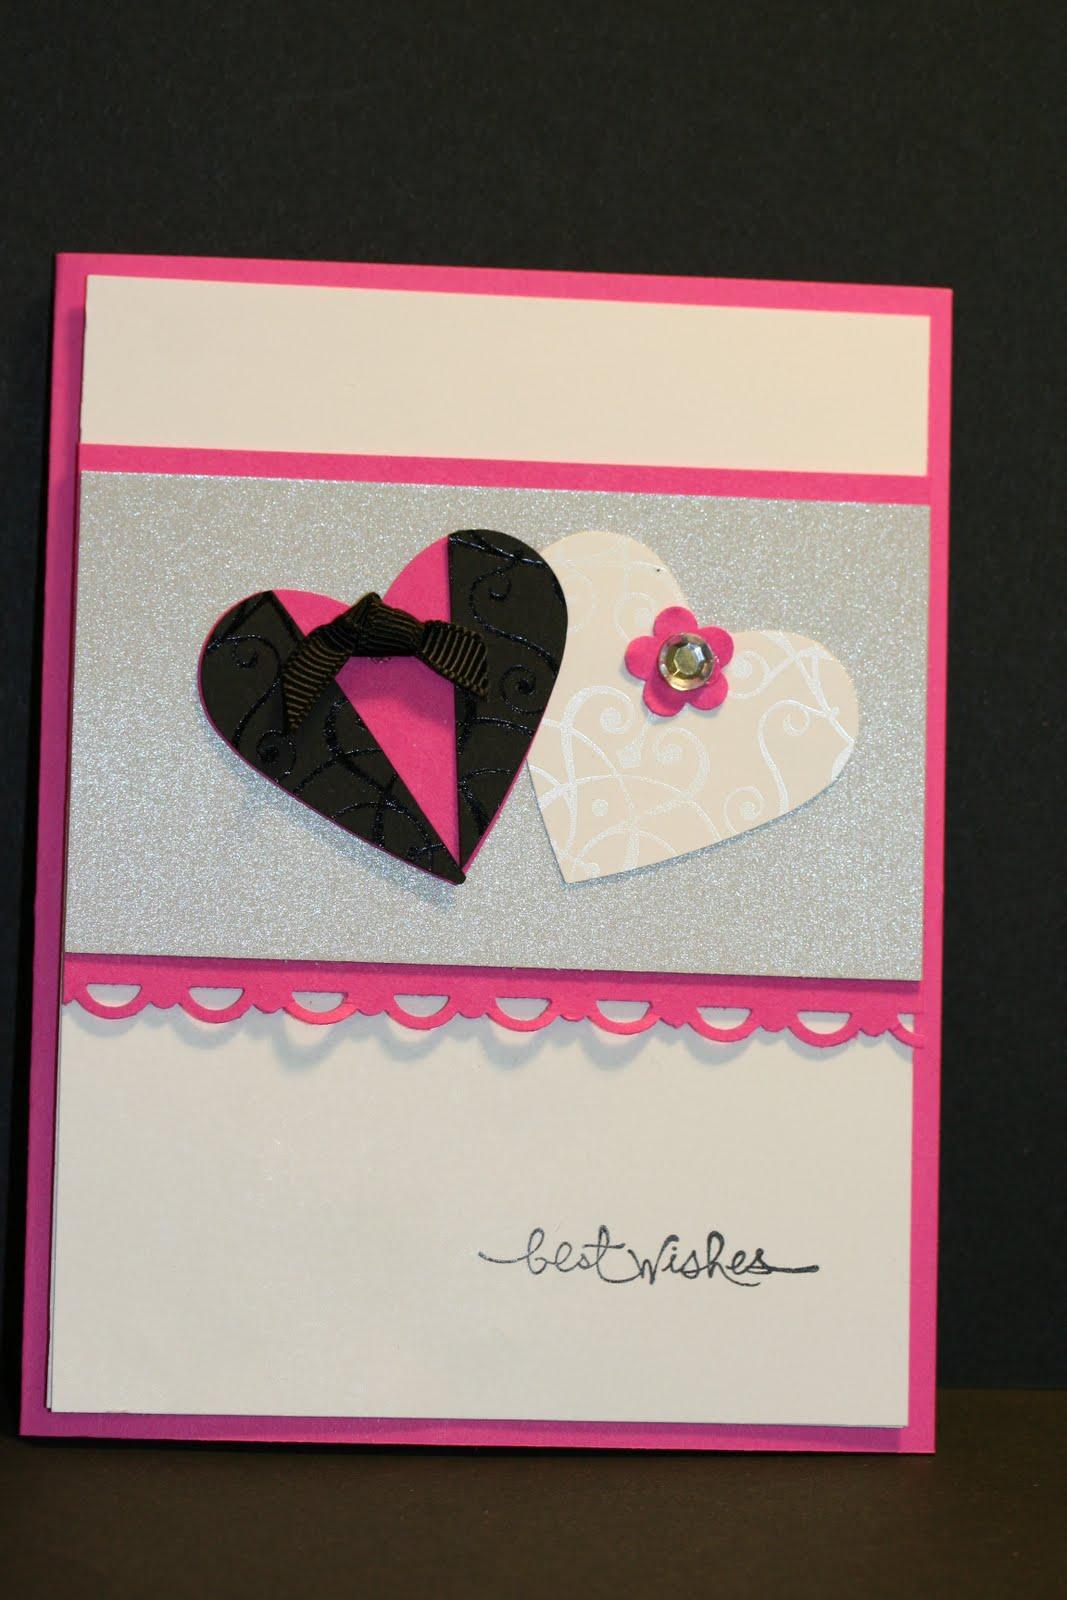 Sabi's blog: creative wedding cards design